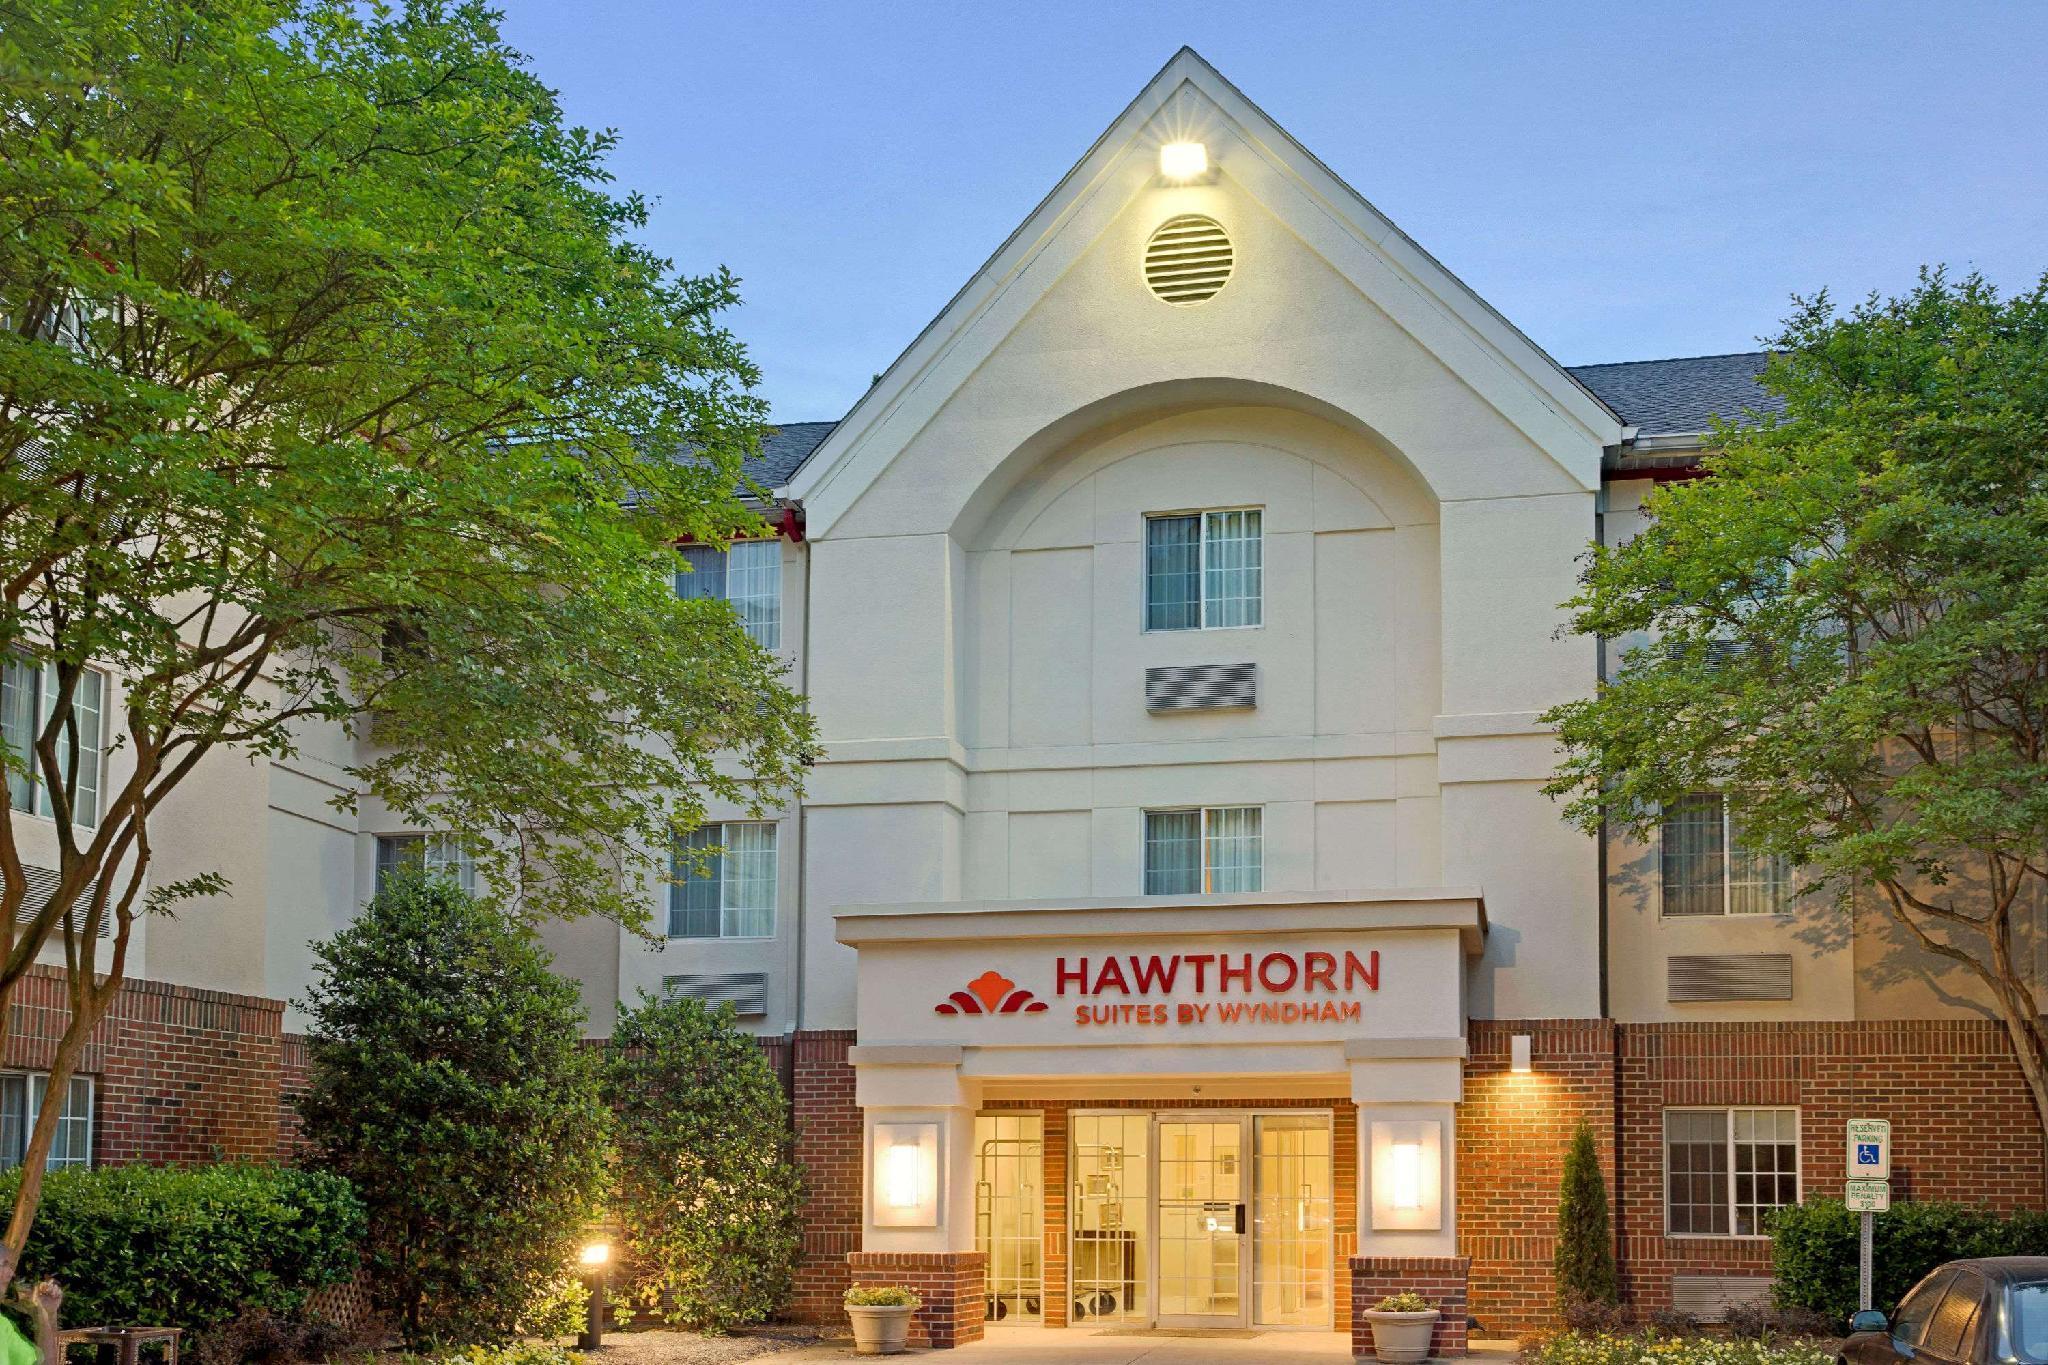 Hawthorn Suites By Wyndham Charlotte Executive Park